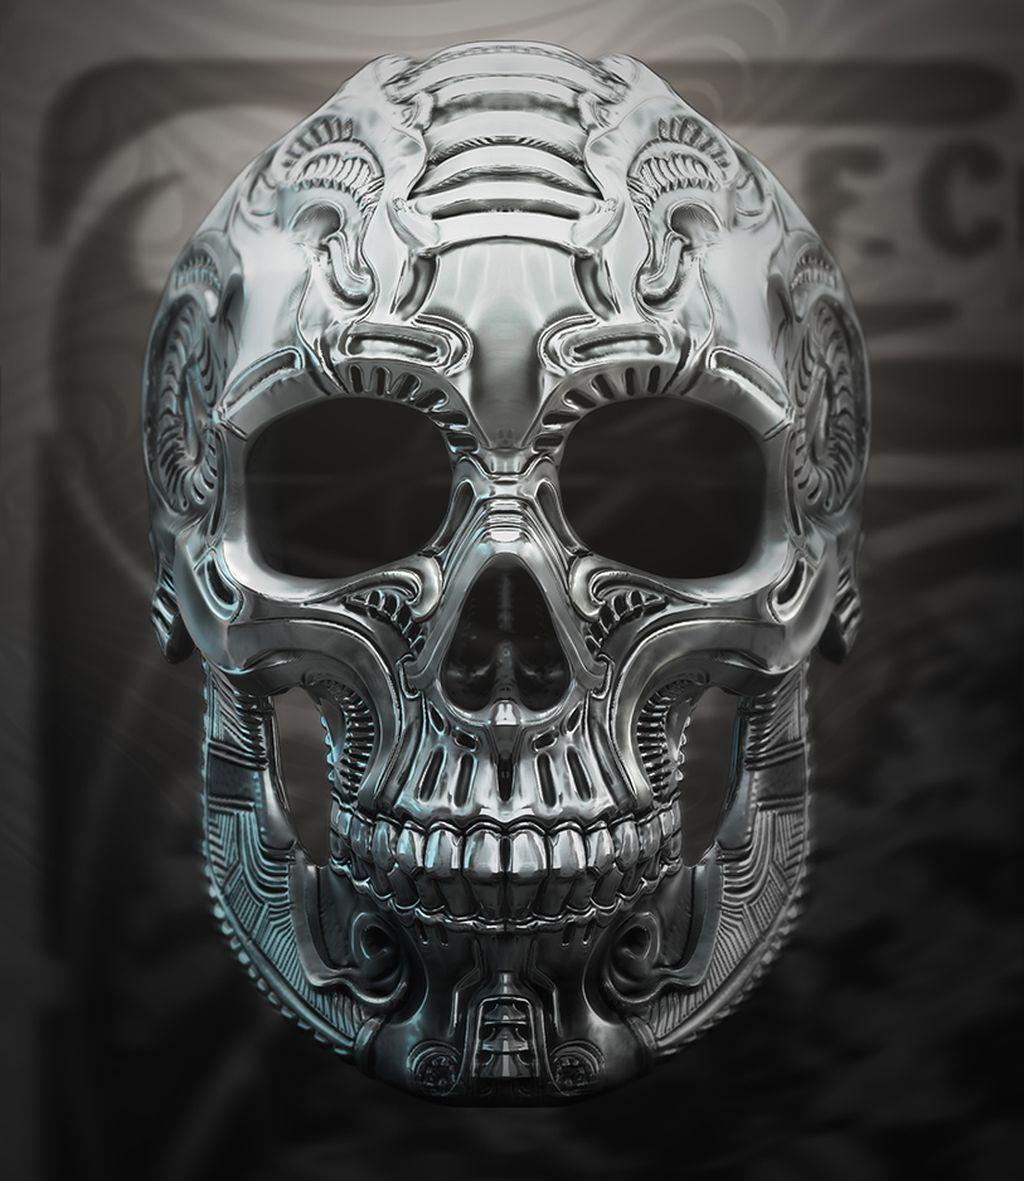 Skull Ring design concept